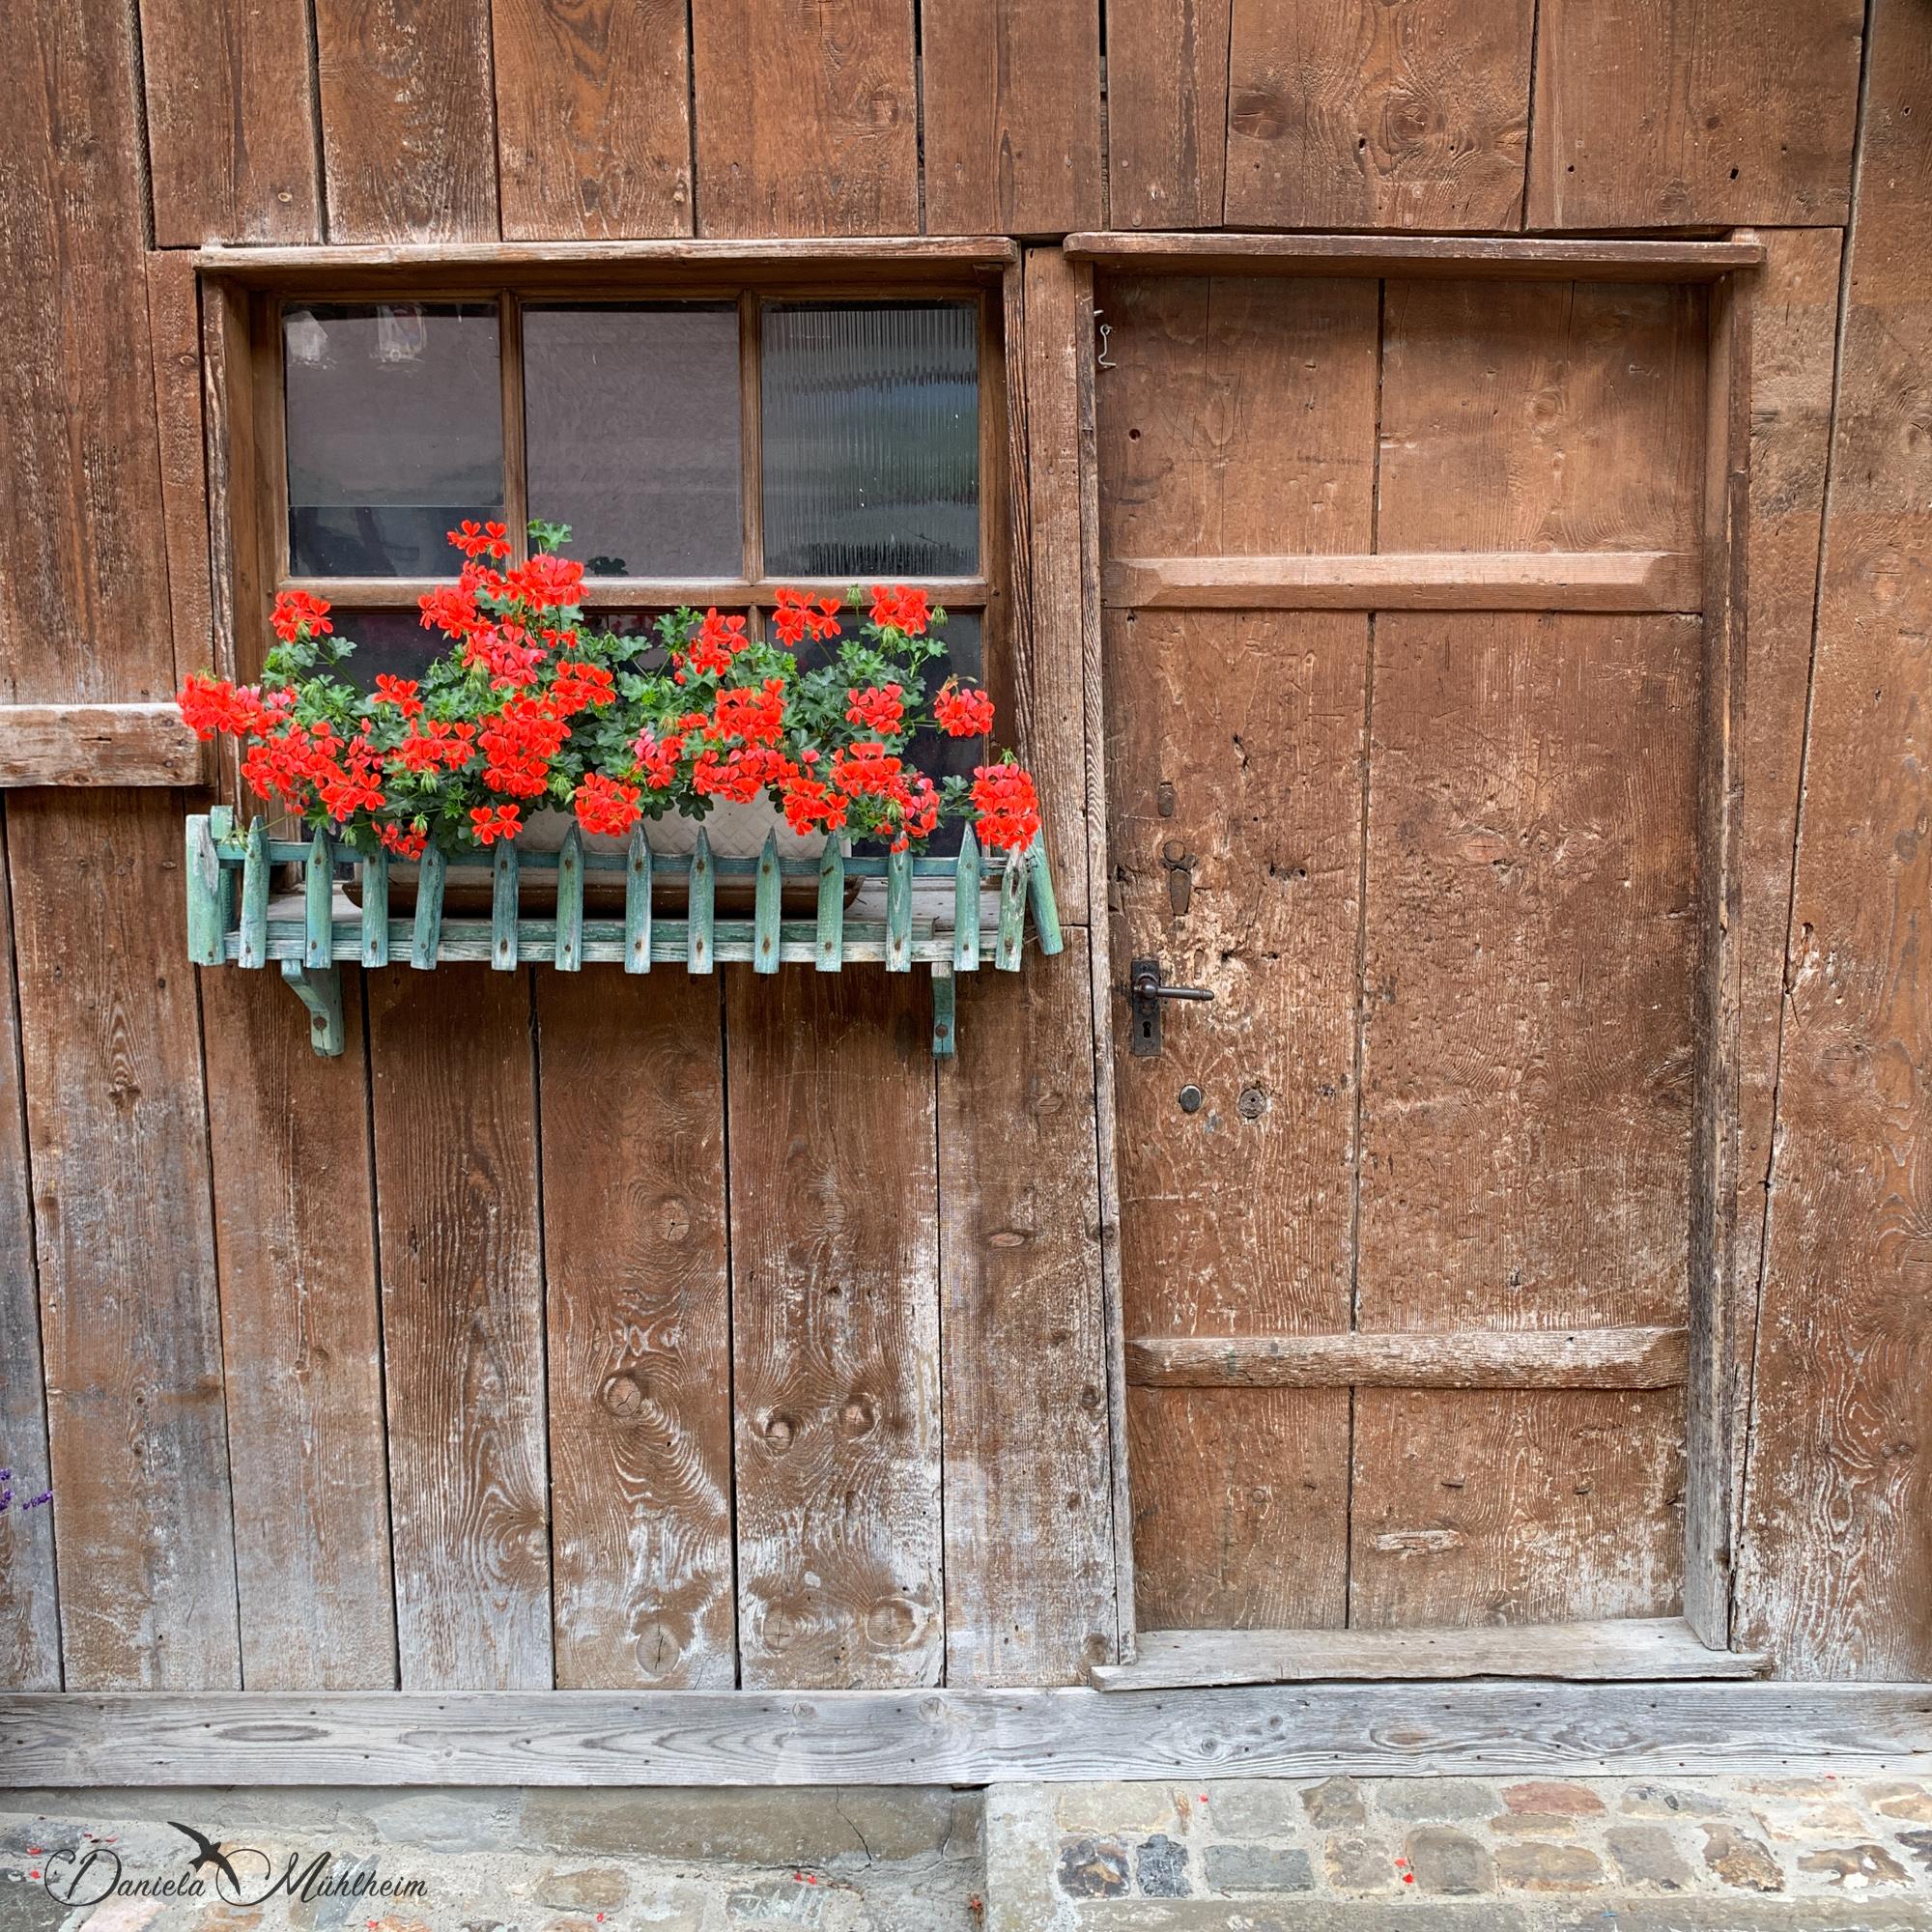 daniela, muehlheim, danielamühlheim, ladybird, exploring, earth, abundance, switzerland, danielamuehlheim, schweiz, door